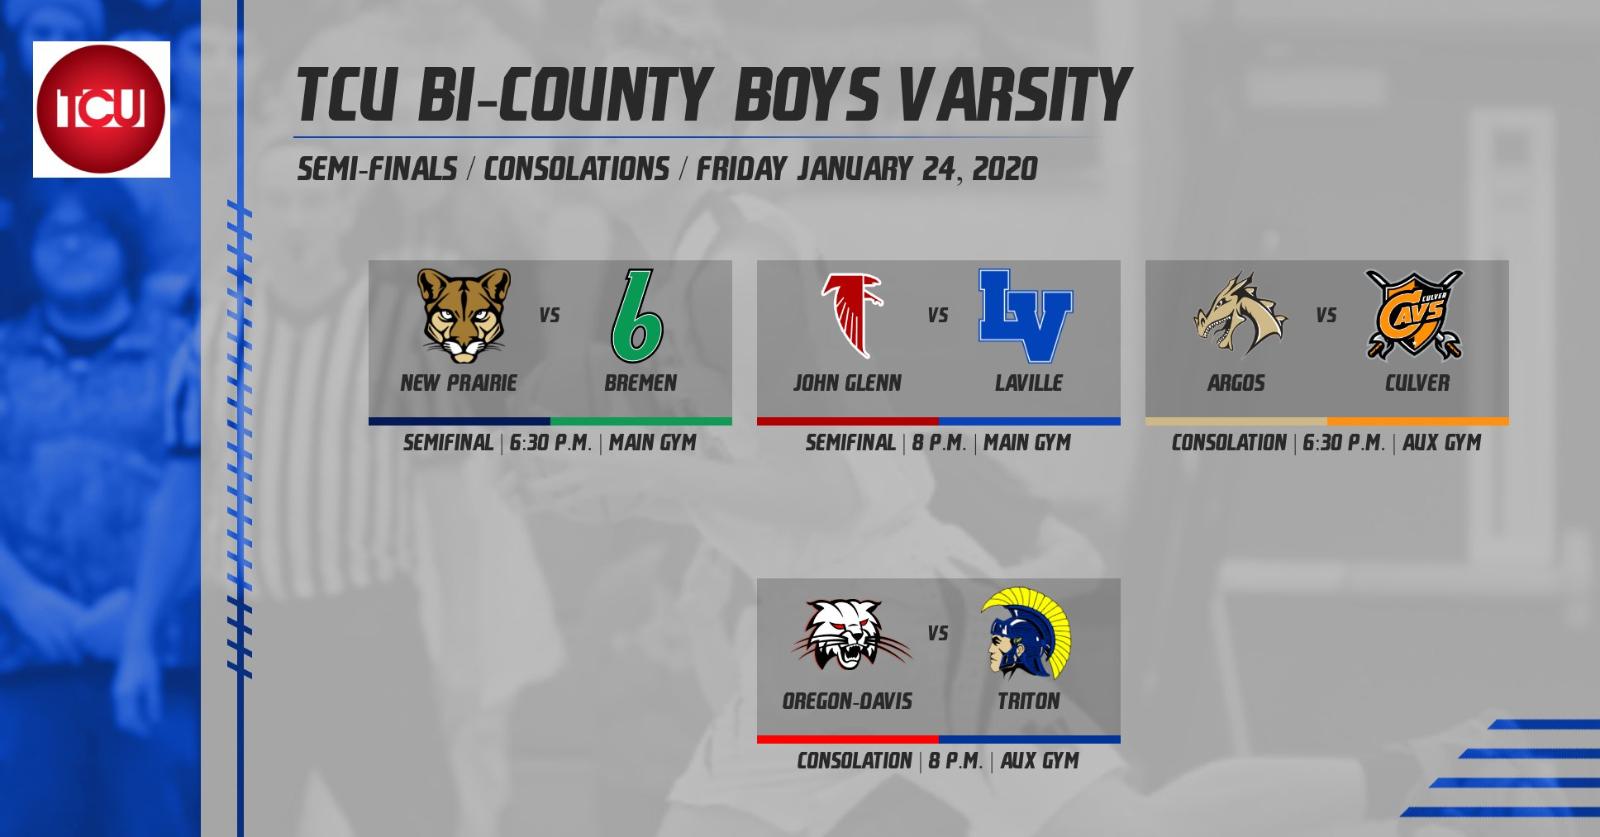 TCU Bi-County Basketball Pairings: Friday, January 24